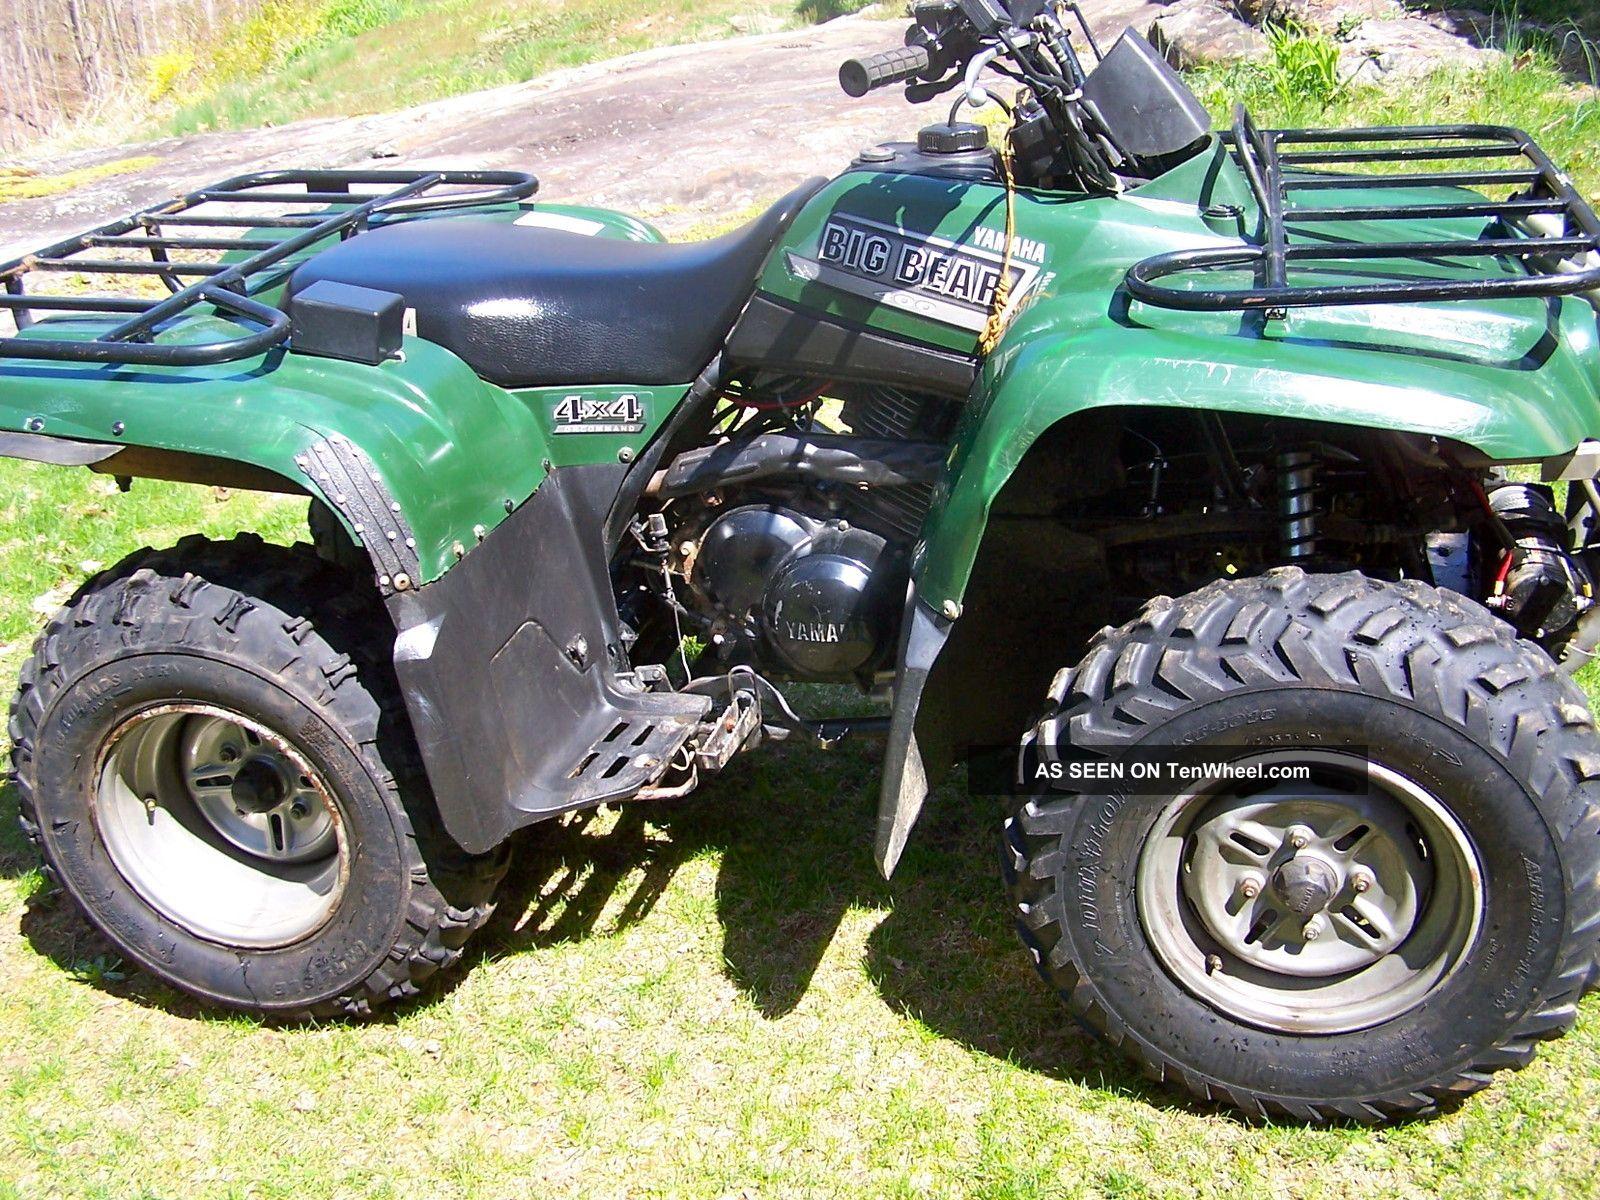 2002 Kawasaki 650 Atv Wiring Diagram Will Be A Thing For 2007 350 Yamaha 99 Wolverine Prairie Diagrams Dummies Mule